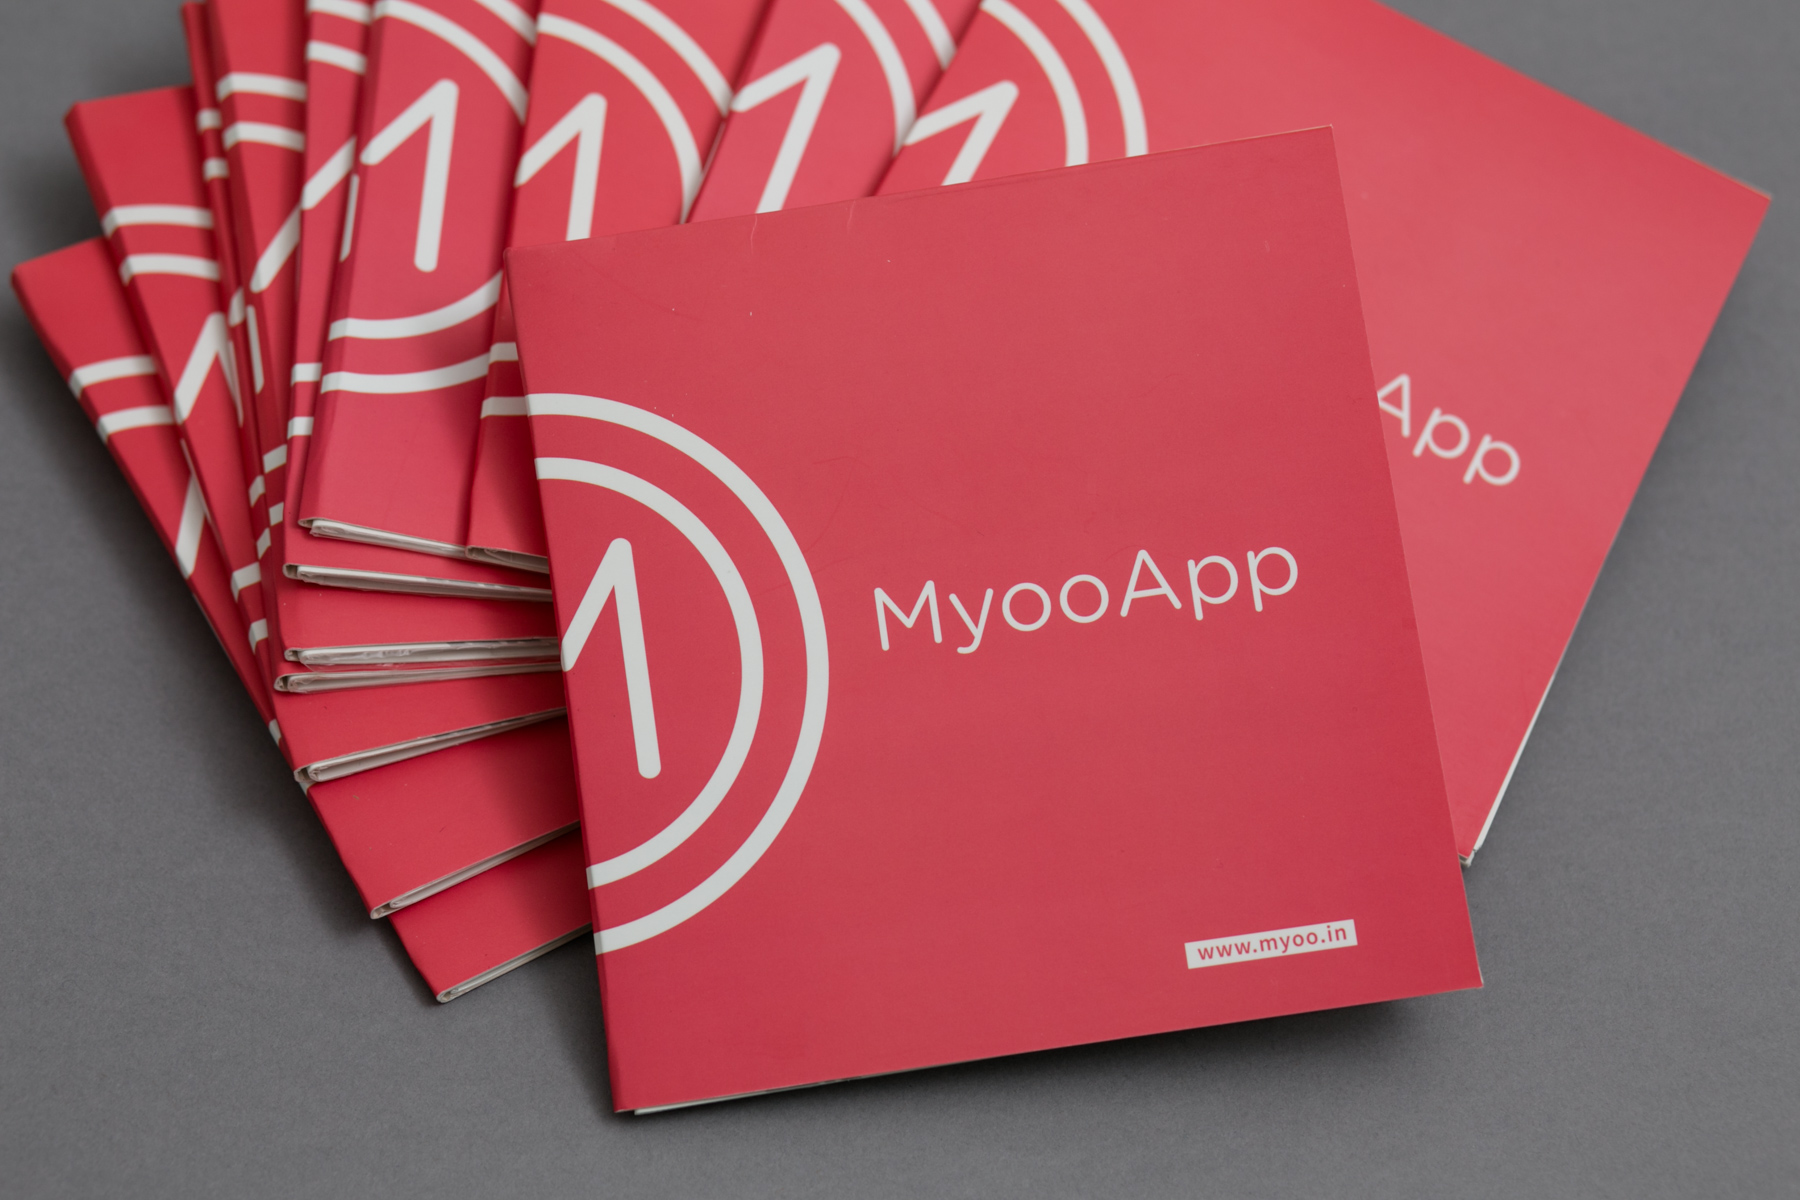 myooapp-005.jpg